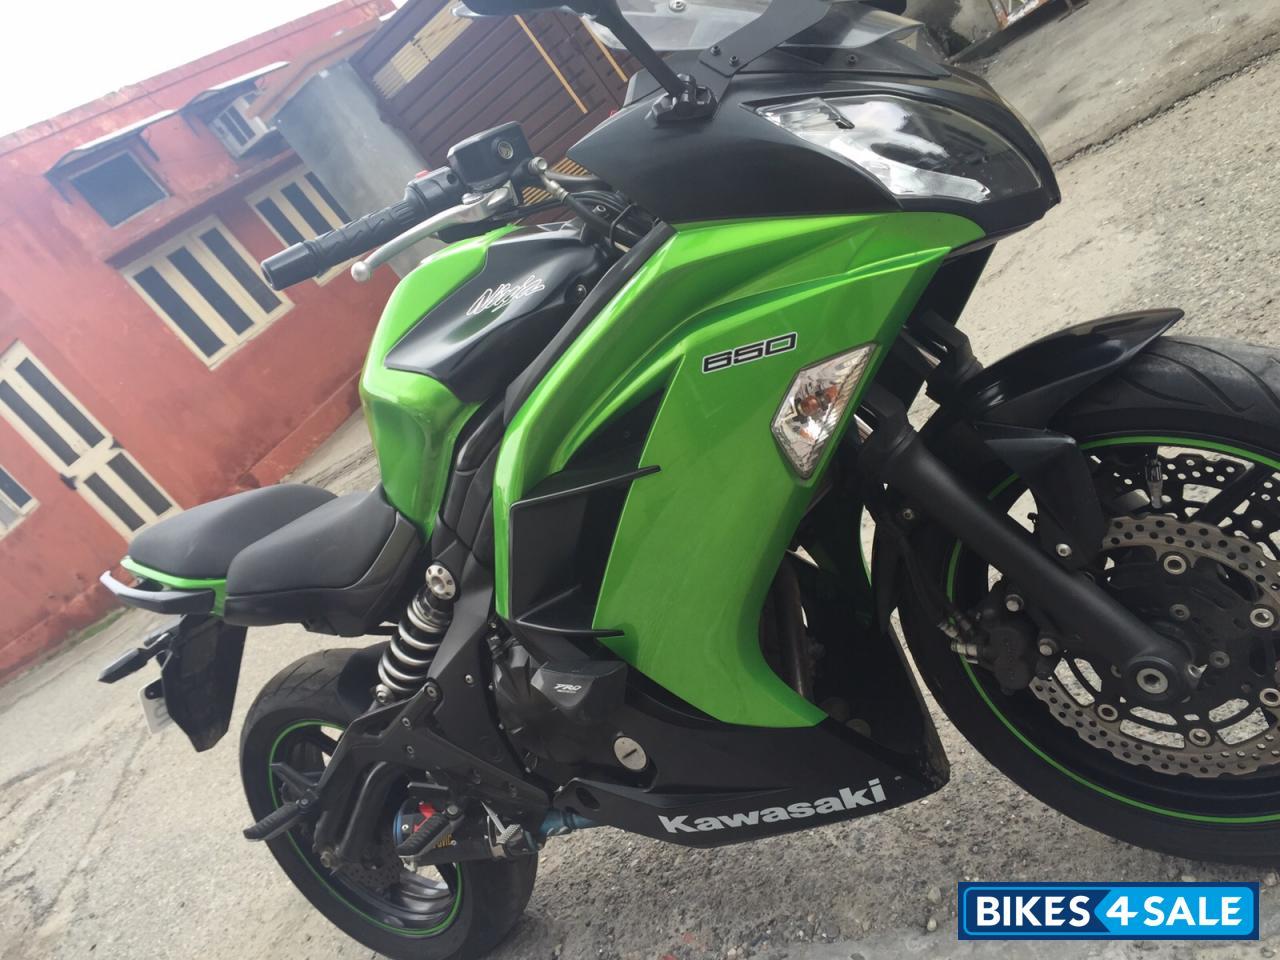 Used Kawasaki Ninja R For Sale In Bangalore